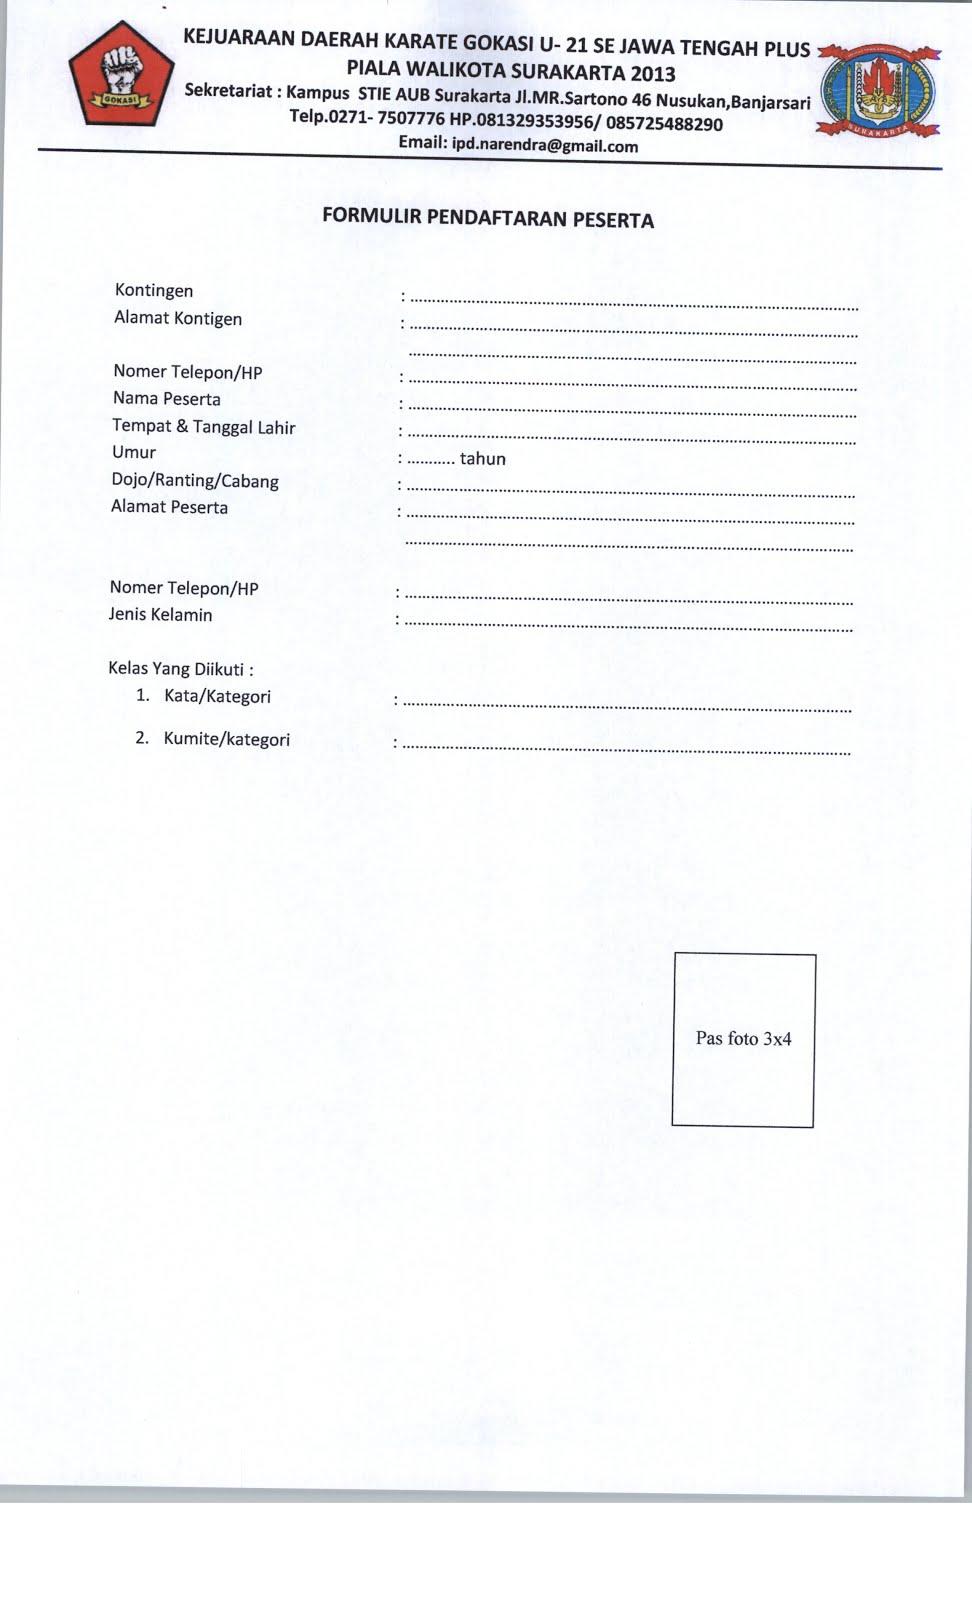 Karate Formulir Pendaftaran Peserta Kejuaraan